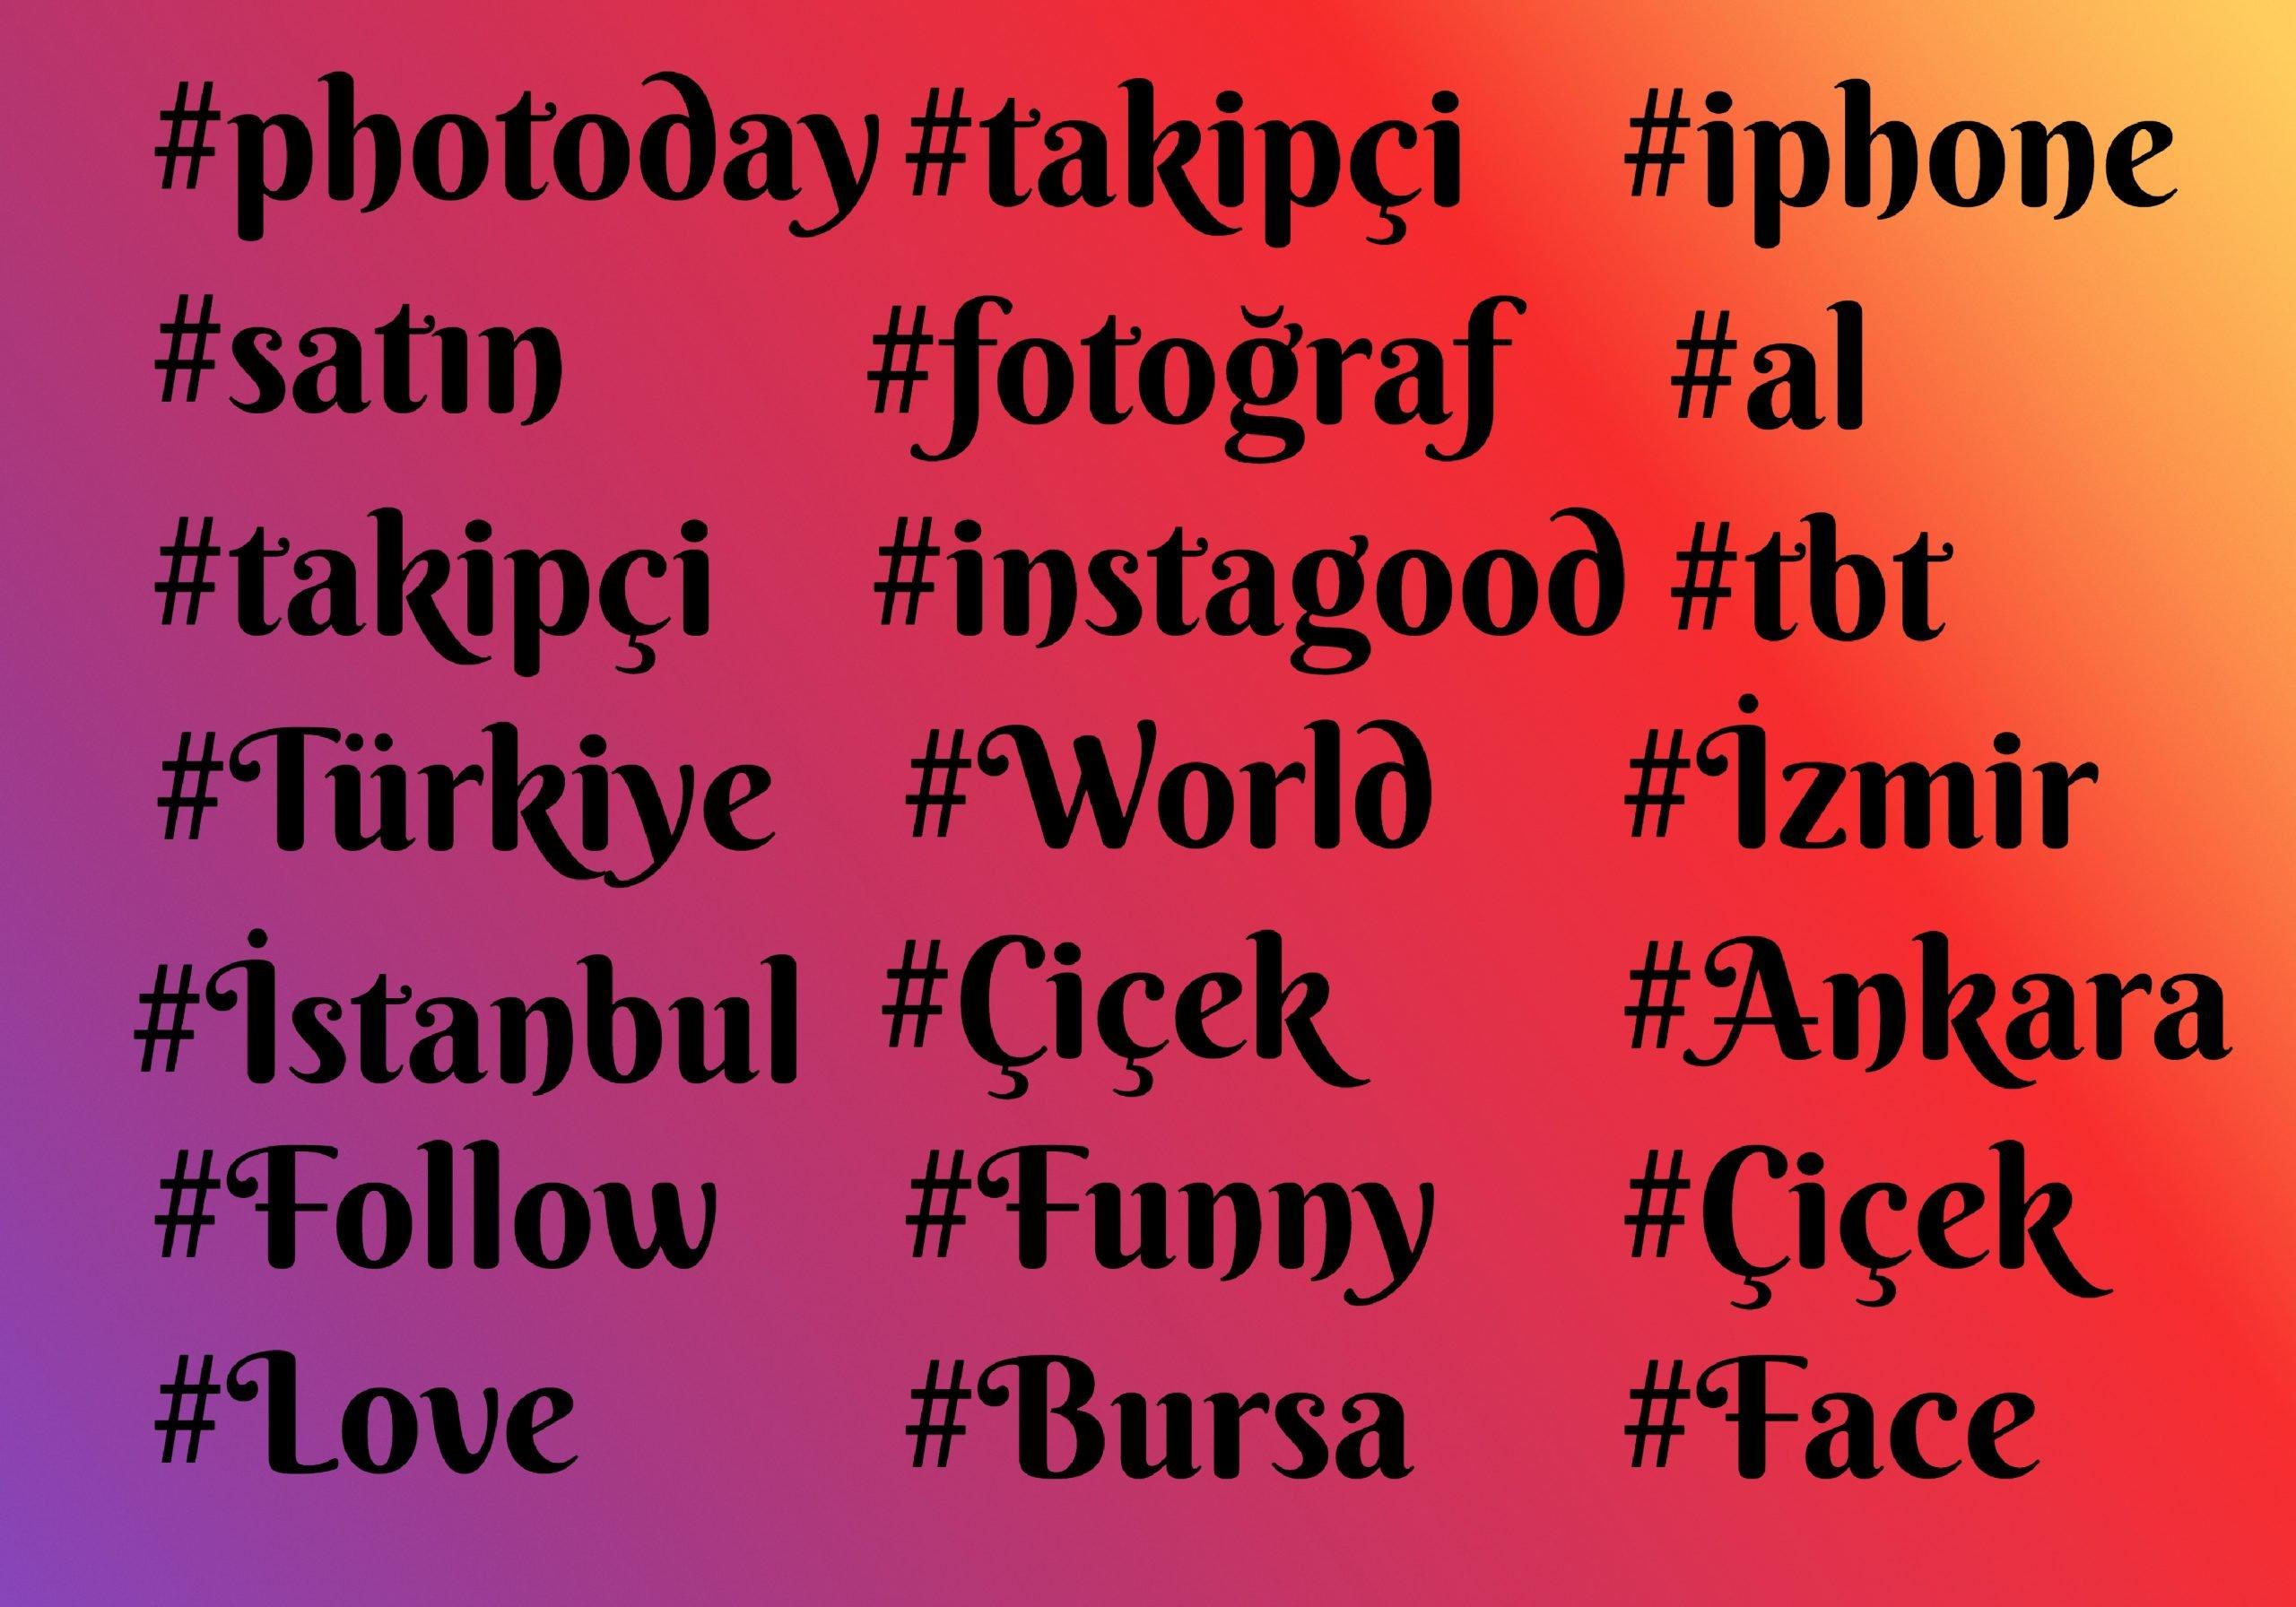 instagram populer hashtag 2020 webhakim